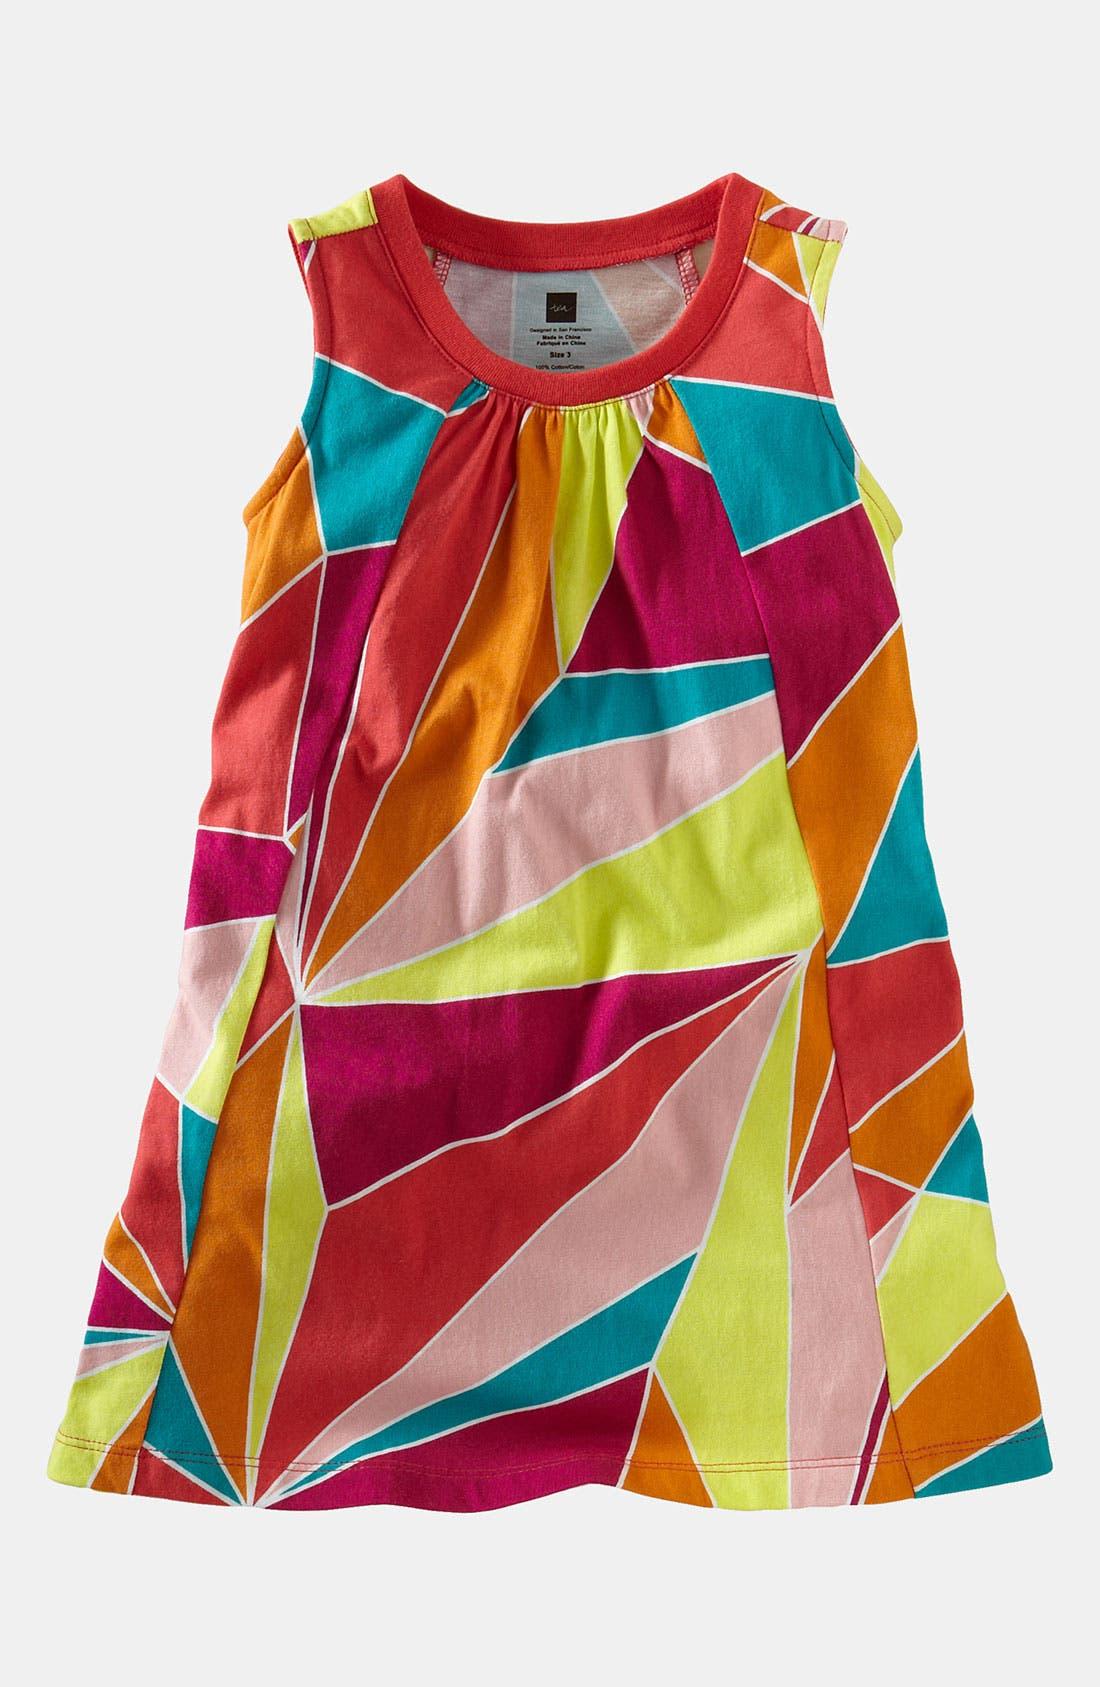 Main Image - Tea Collection 'Bo-Kaap' Dress (Baby)